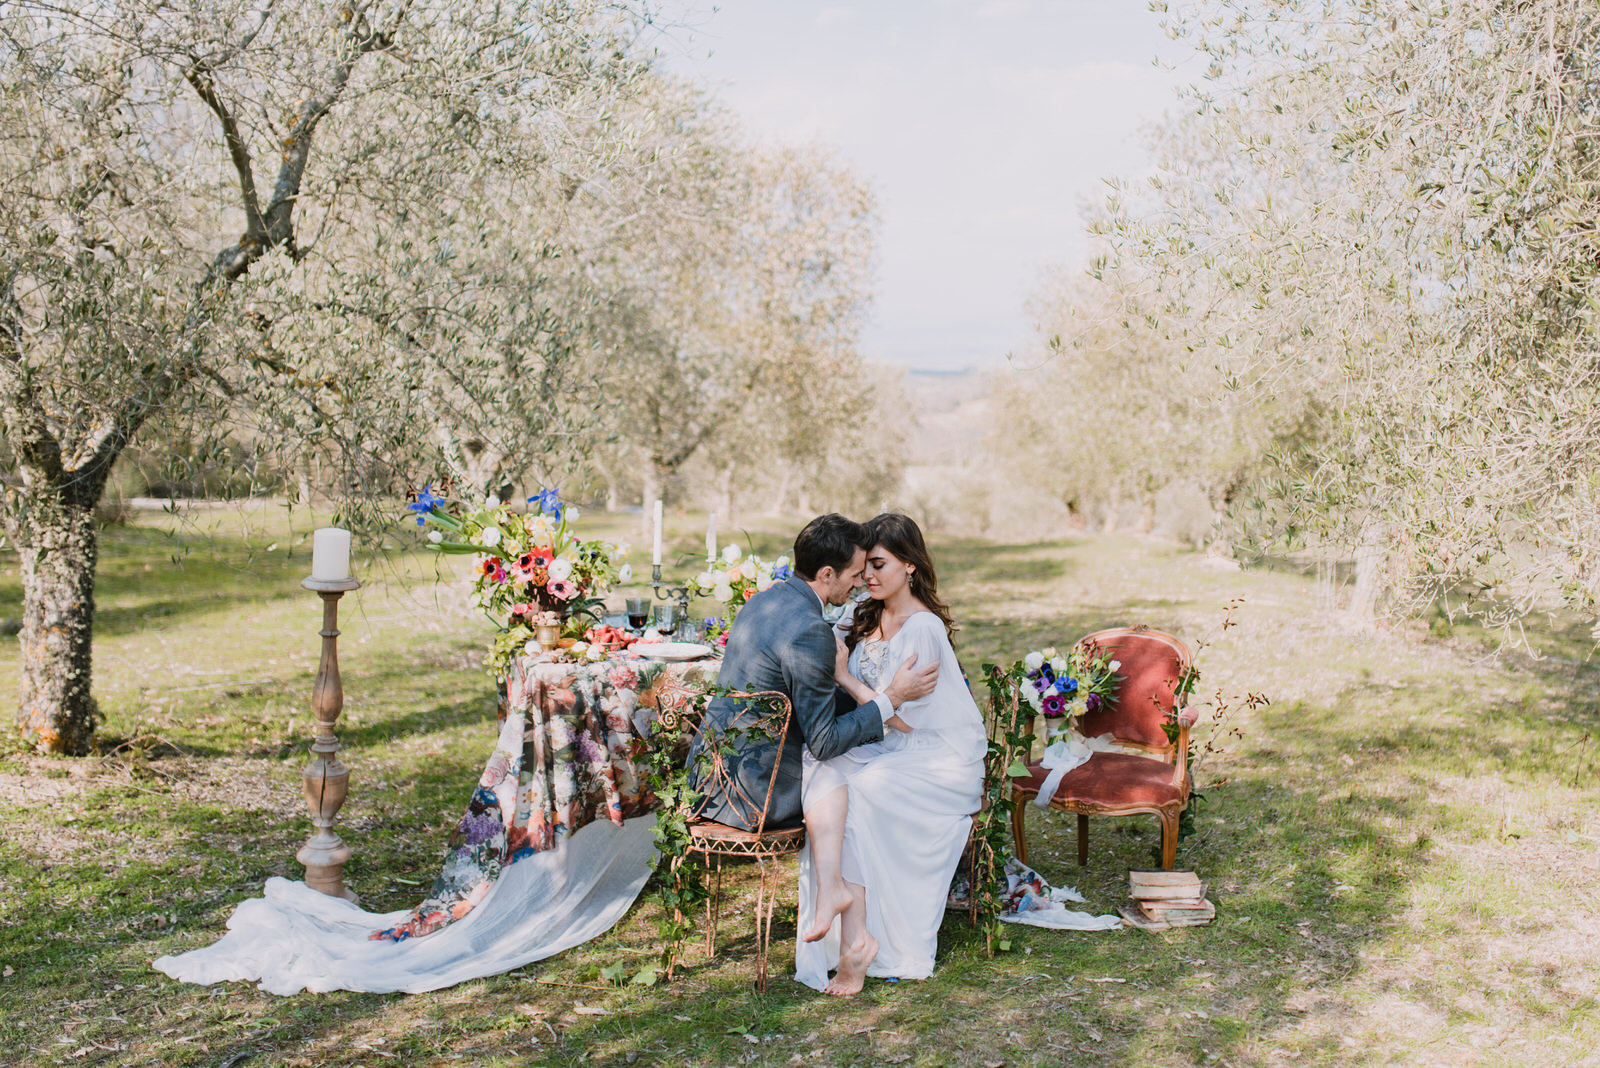 tuscany wedding photography 13.jpg